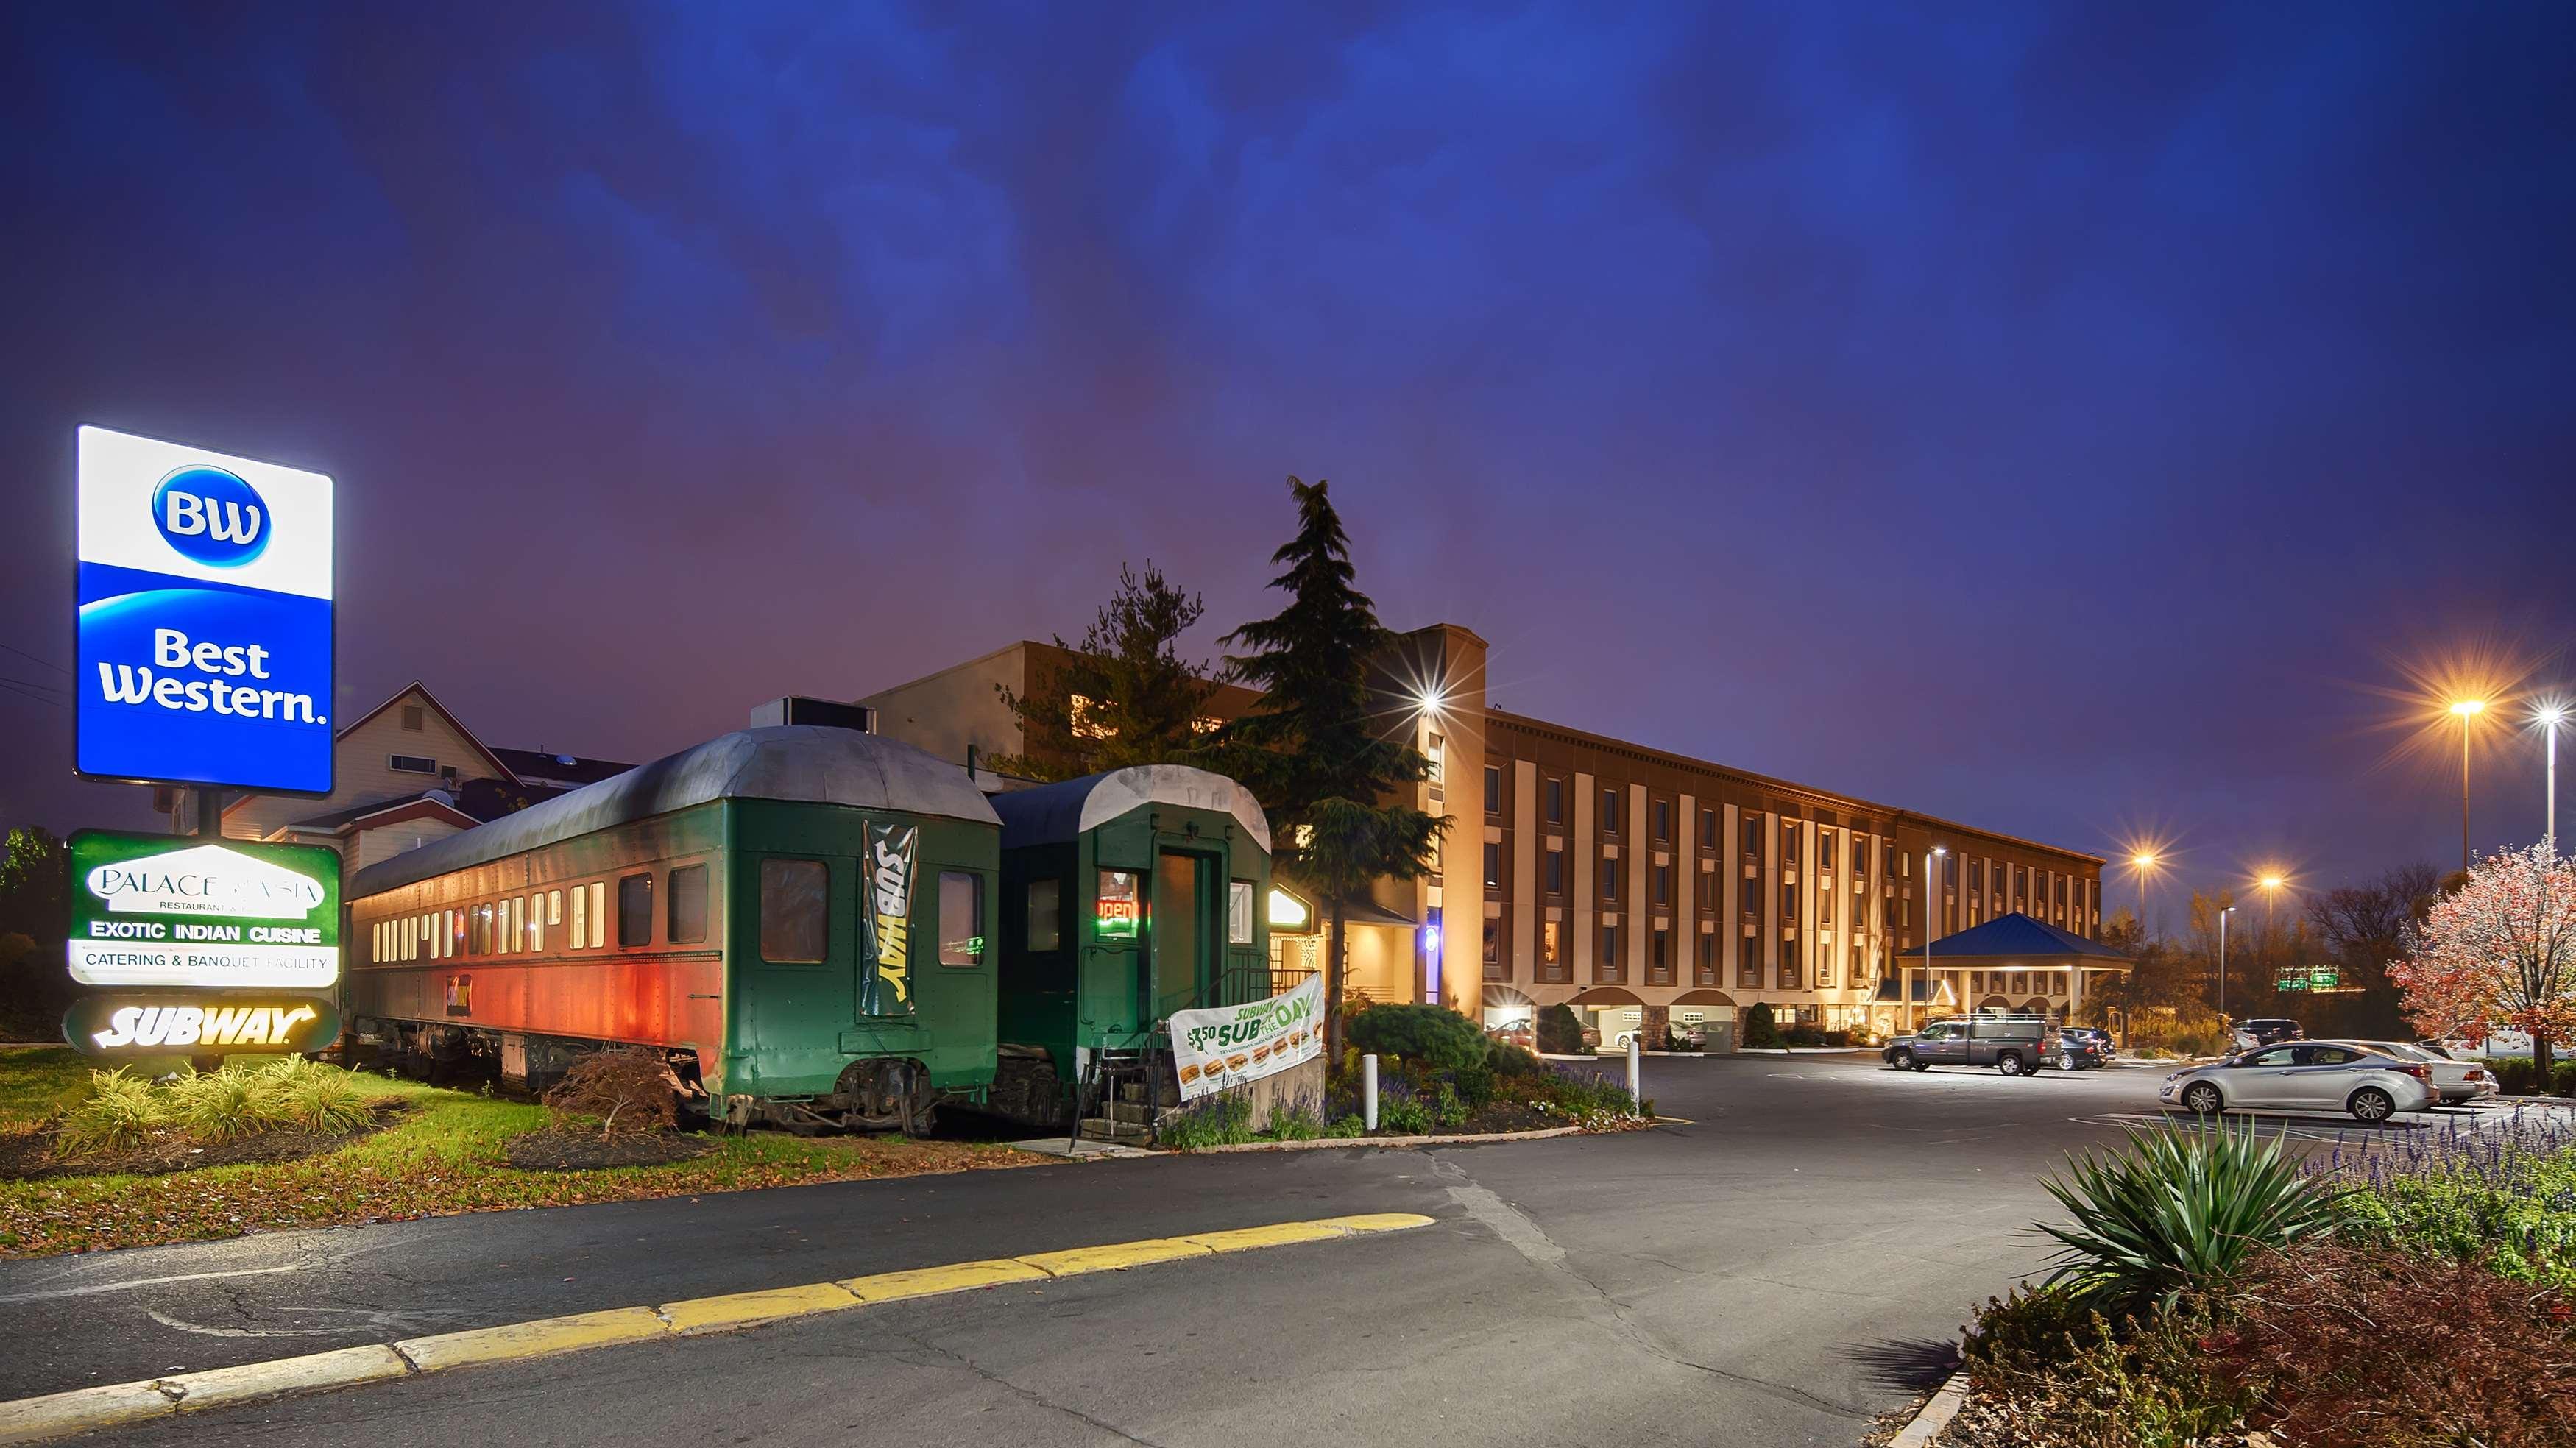 Best Western Fort Washington Inn image 0